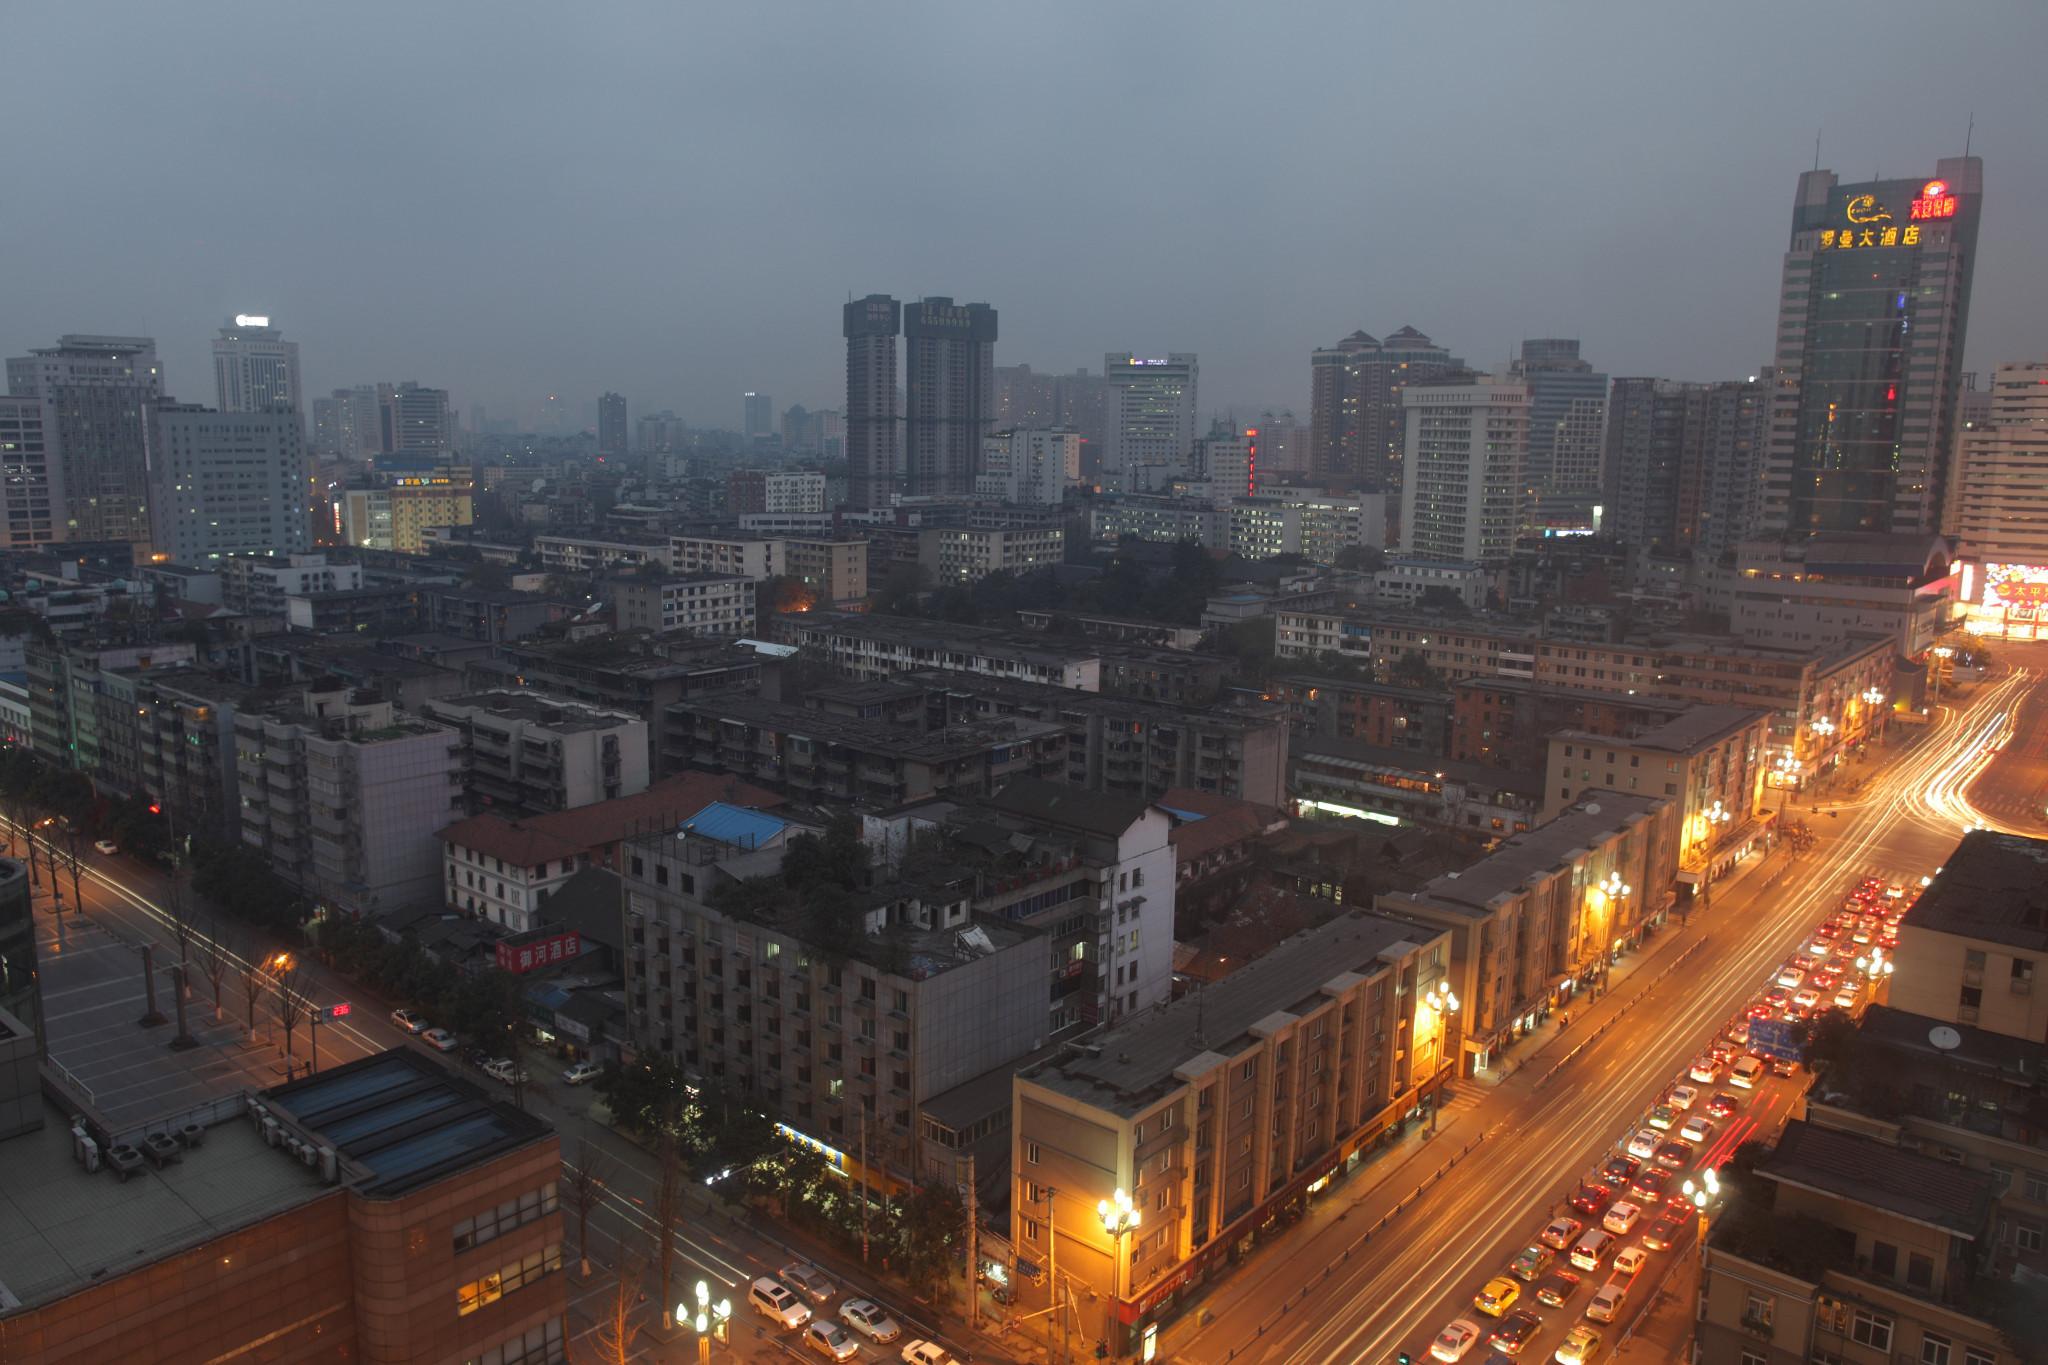 Chengdu 2021 hosts online quiz as part of website renovation